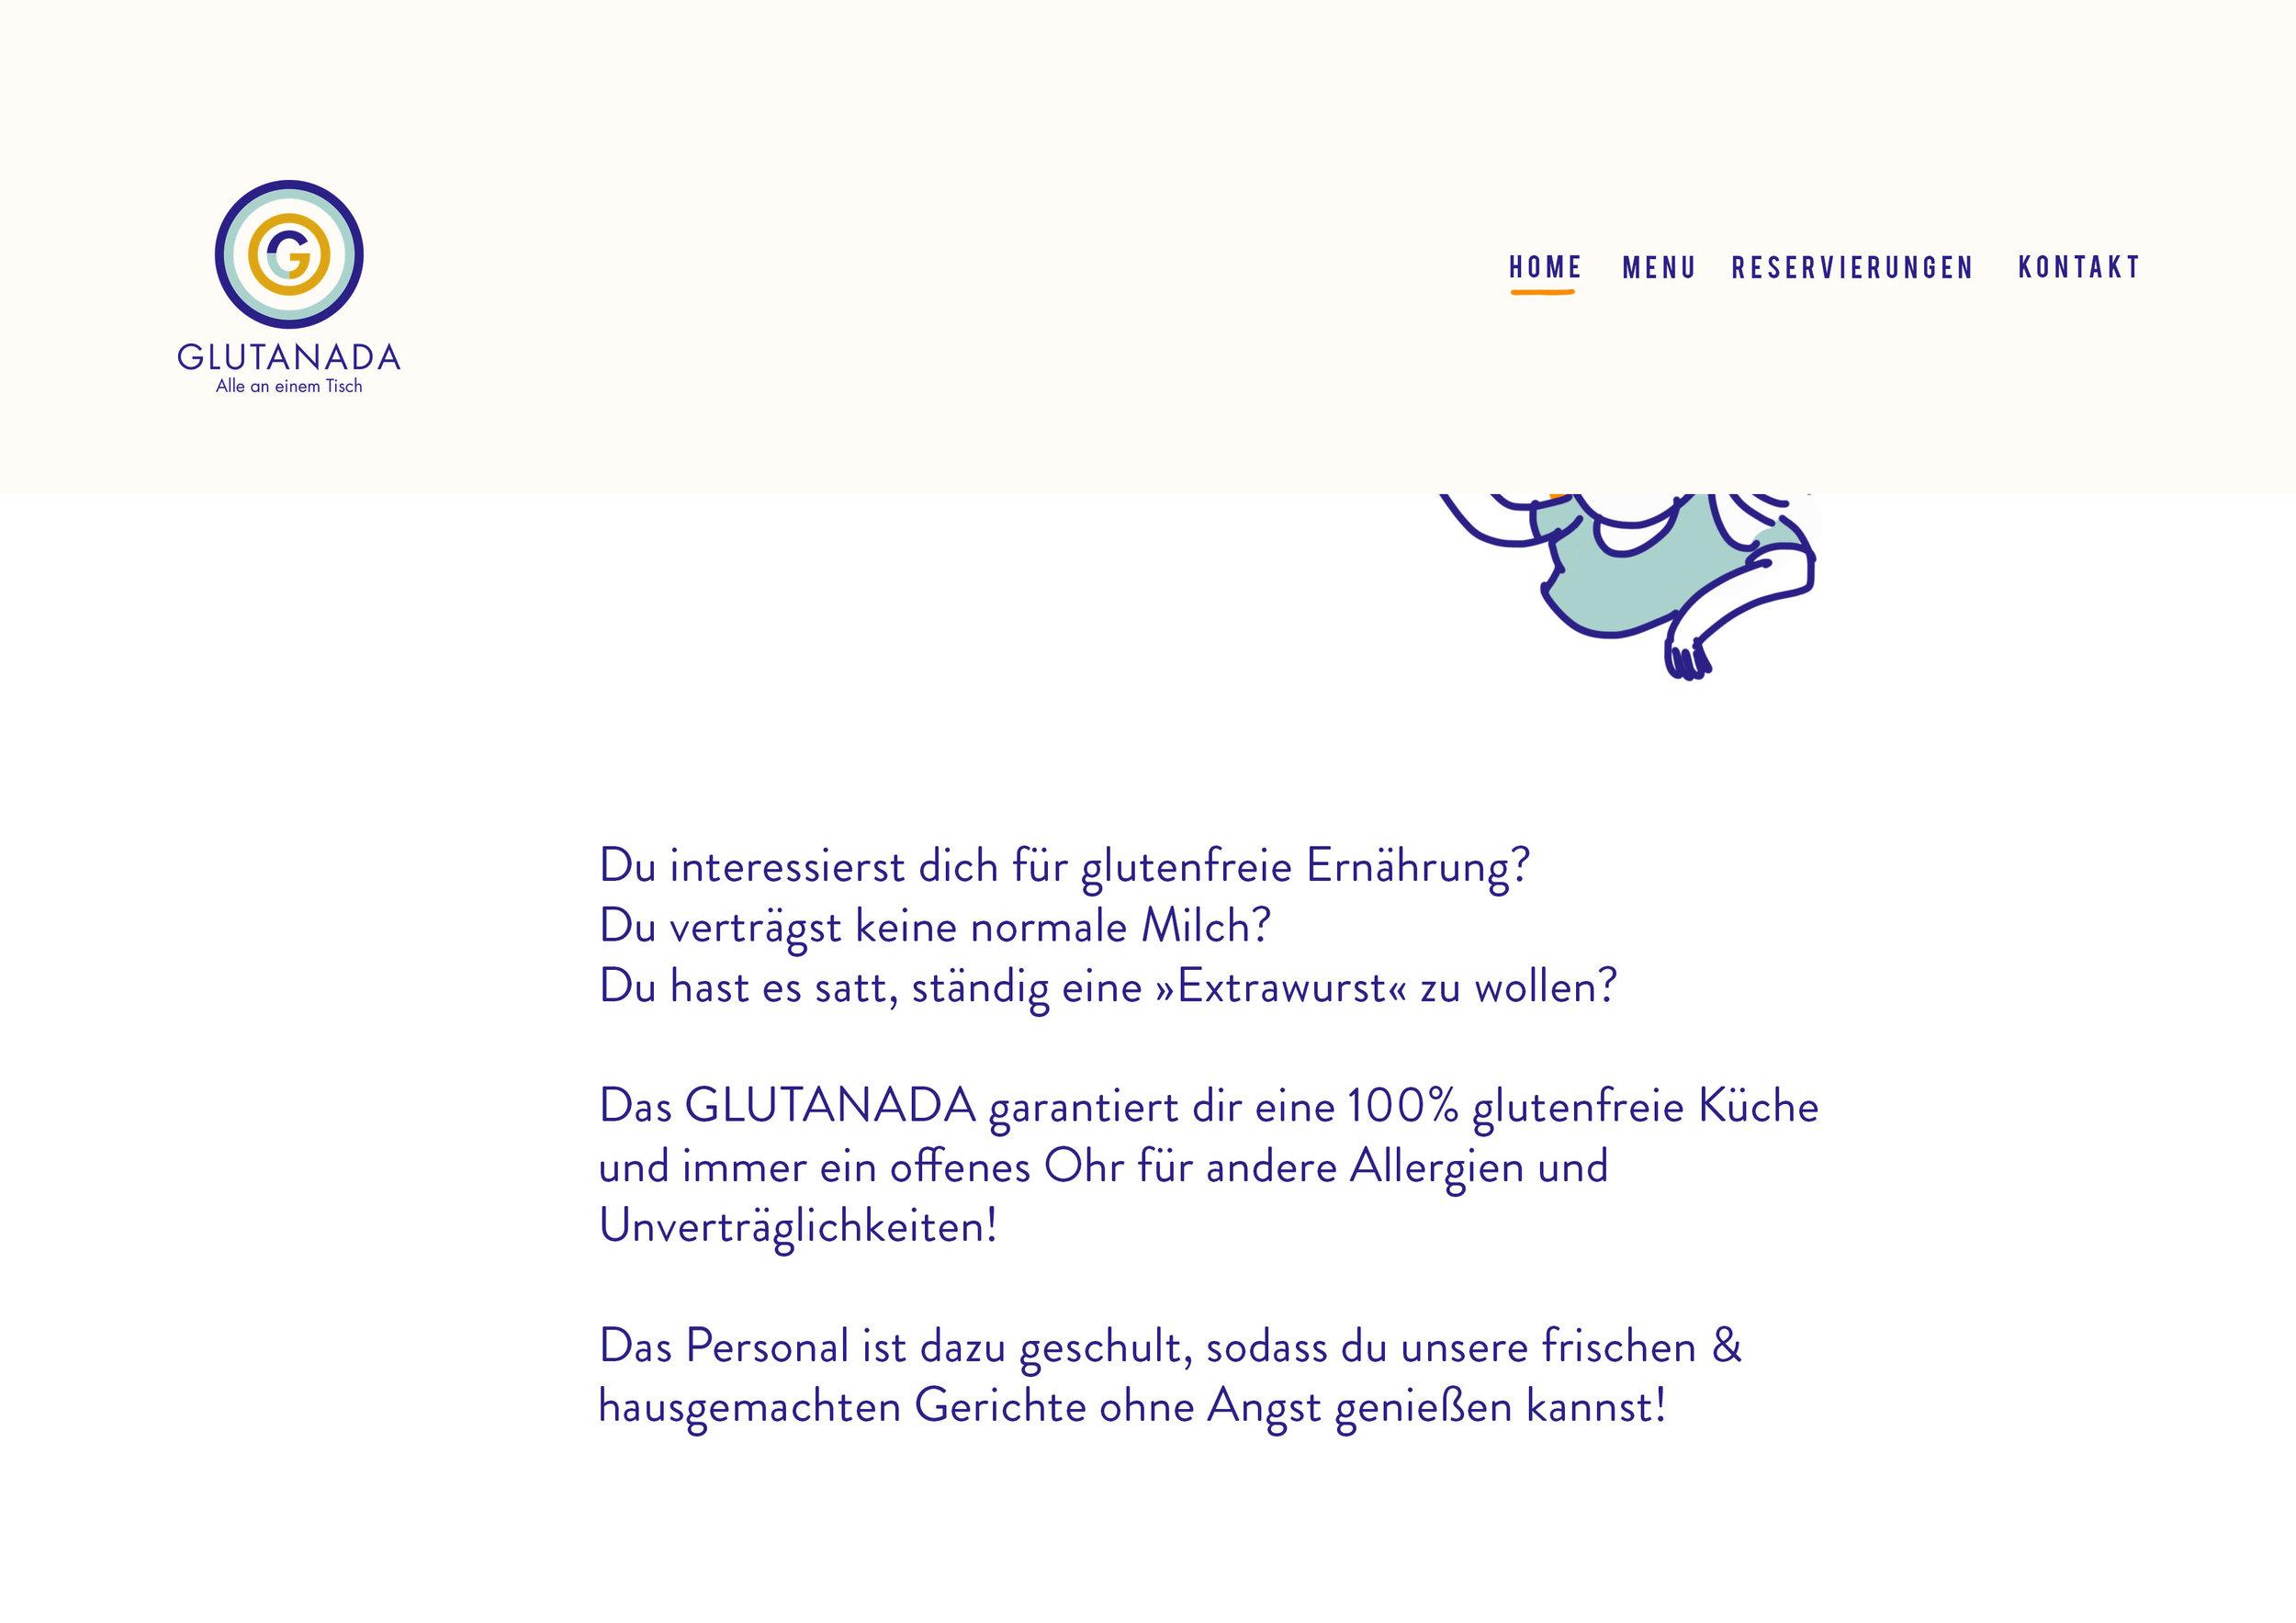 GLUTANADA_web_idee_4.jpg